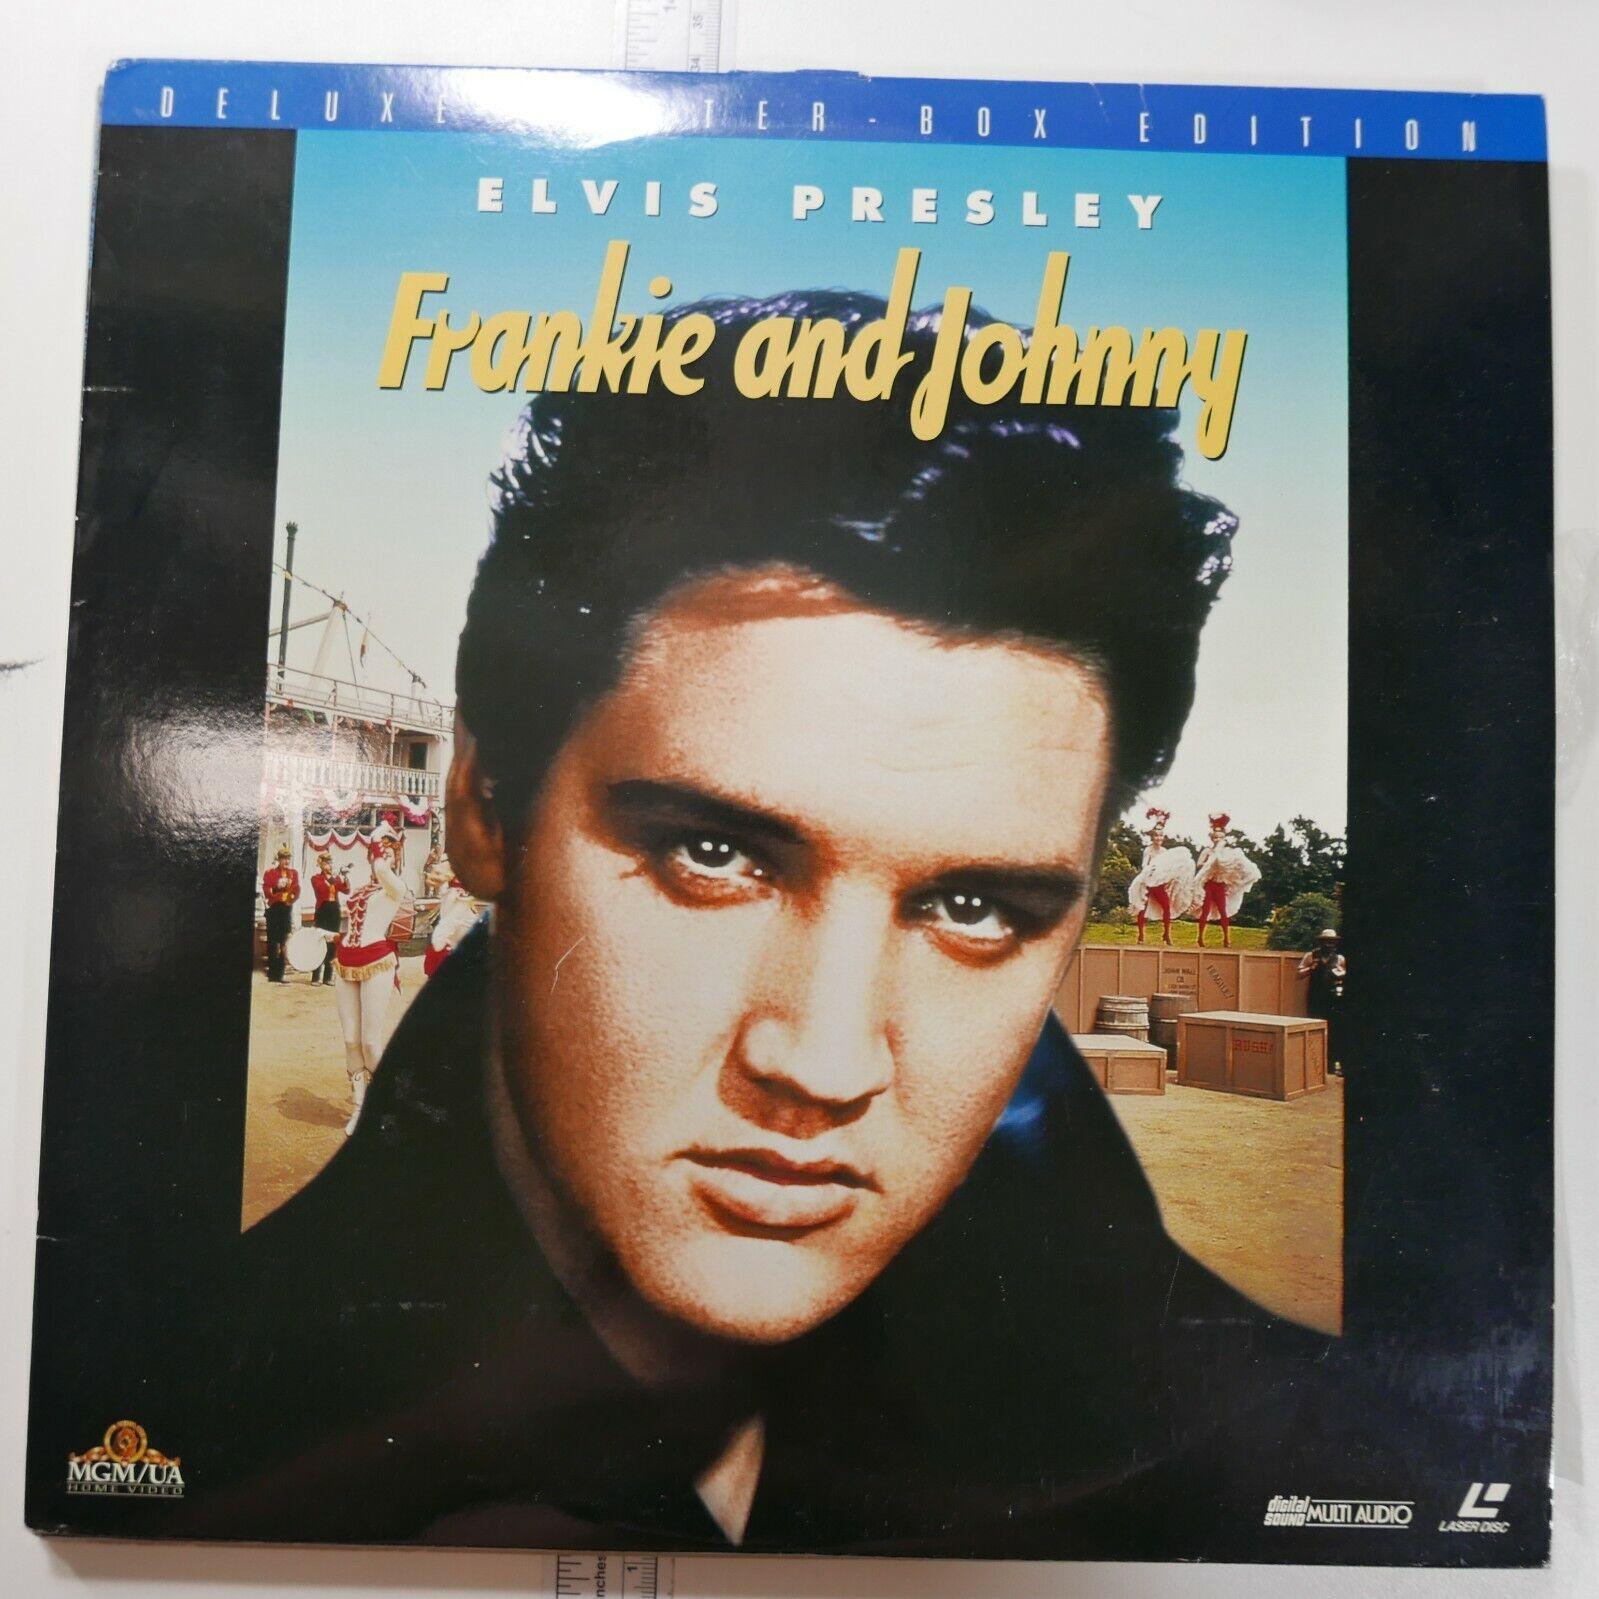 ELVIS PRESLEY - FRANKIE AND JOHNNY LASERDISC Laser Videodisc Letter Box Edition - $11.11